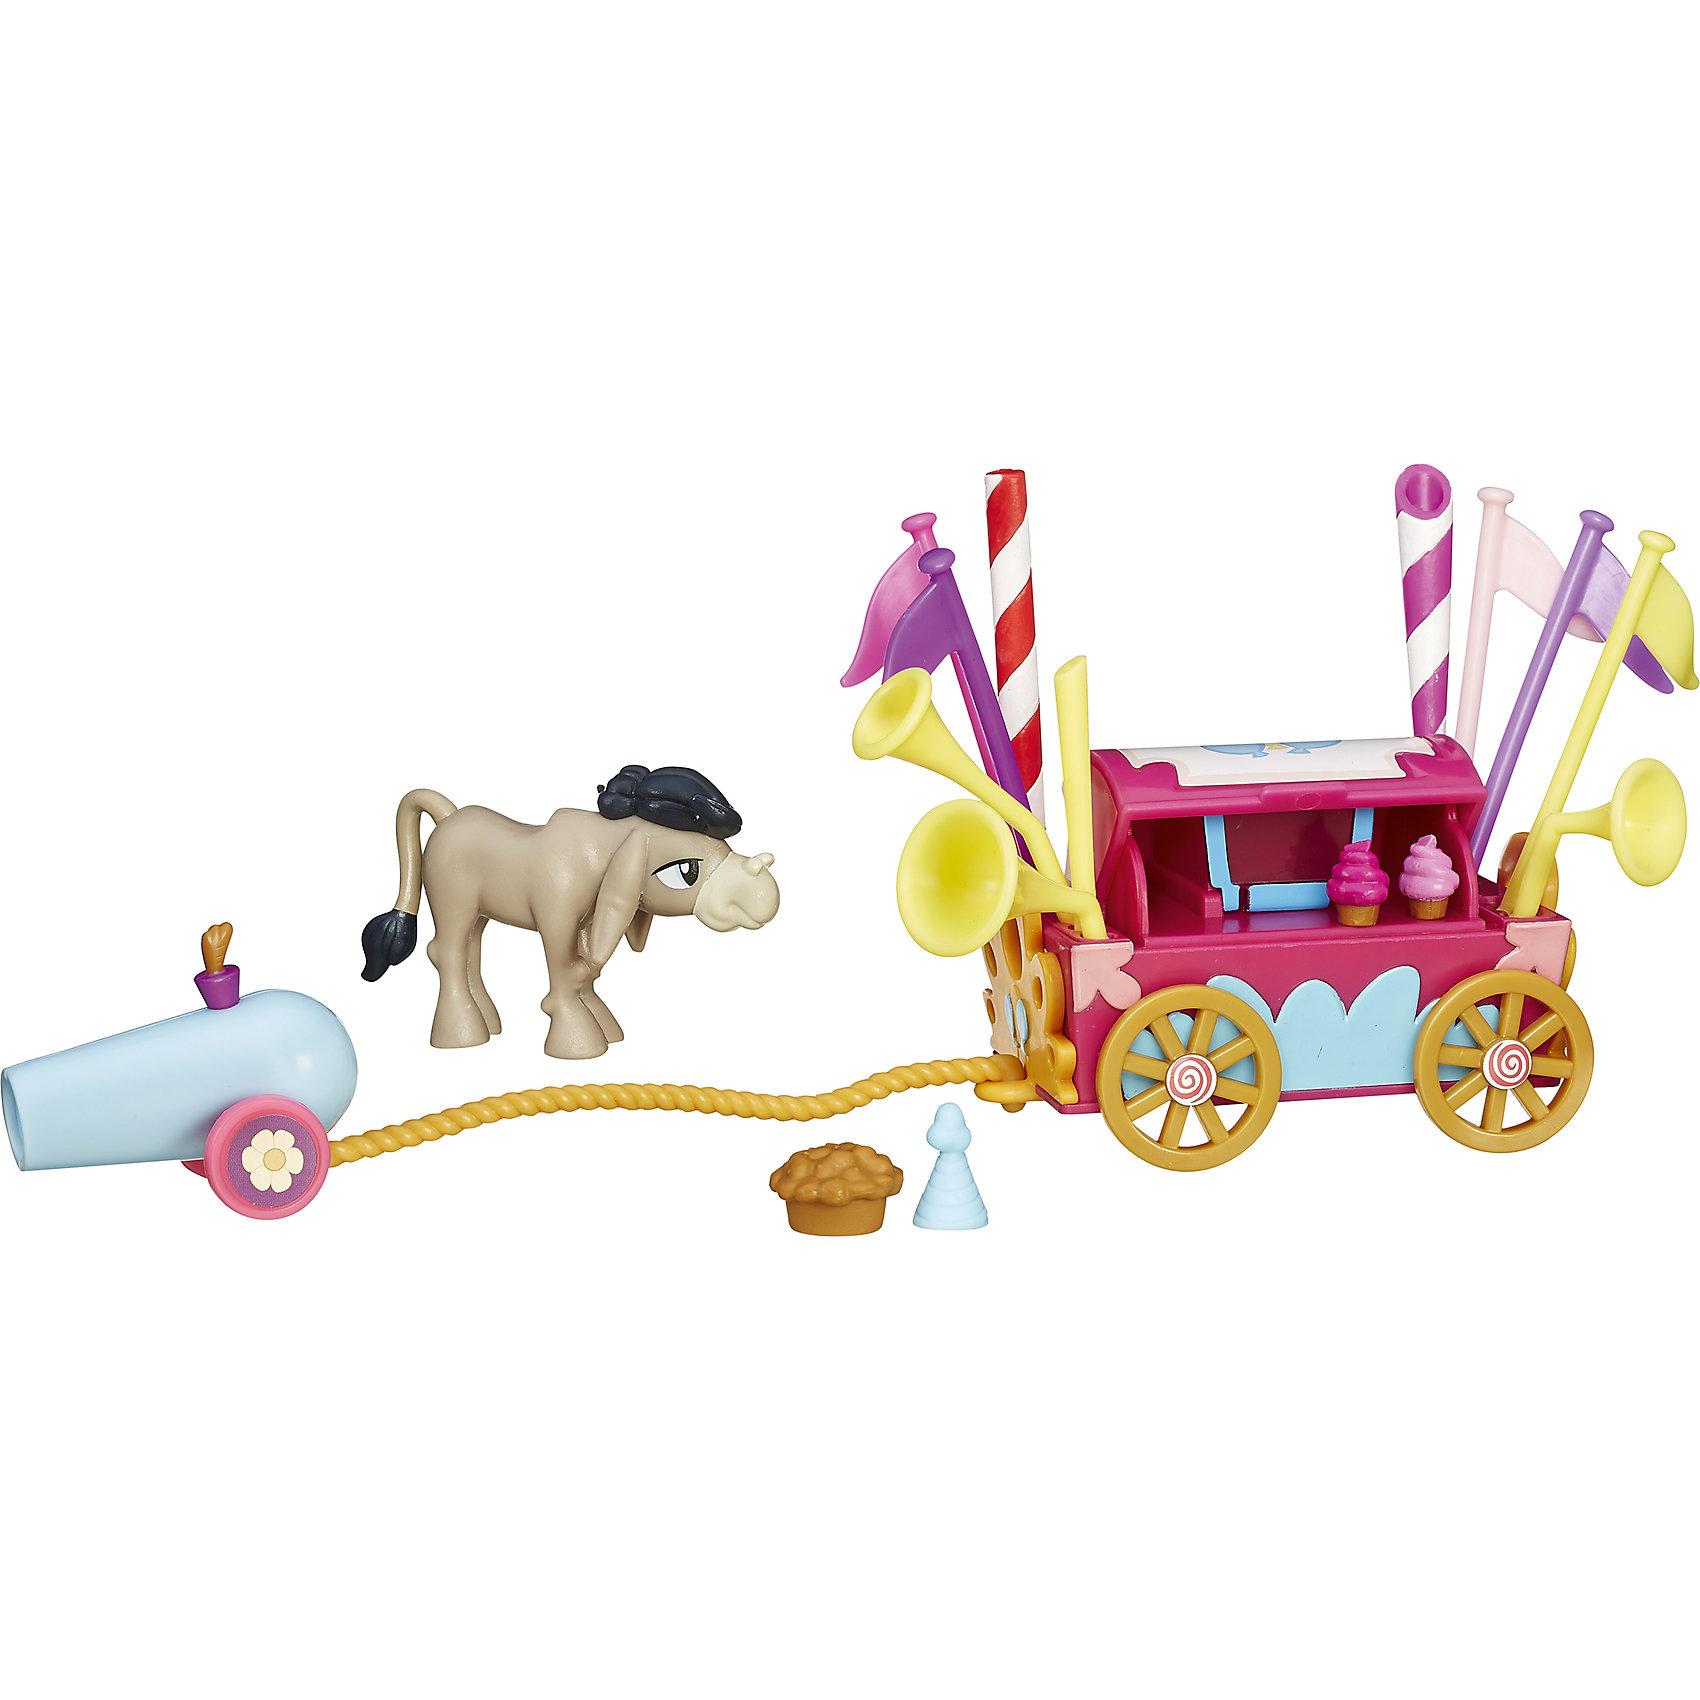 Hasbro Коллекционный игровой мини-набор пони Крэнки Дудл, My little Pony, B3597/B5567 hasbro коллекционный игровой мини набор пони твайлайт спаркл my little pony b3597 b5568